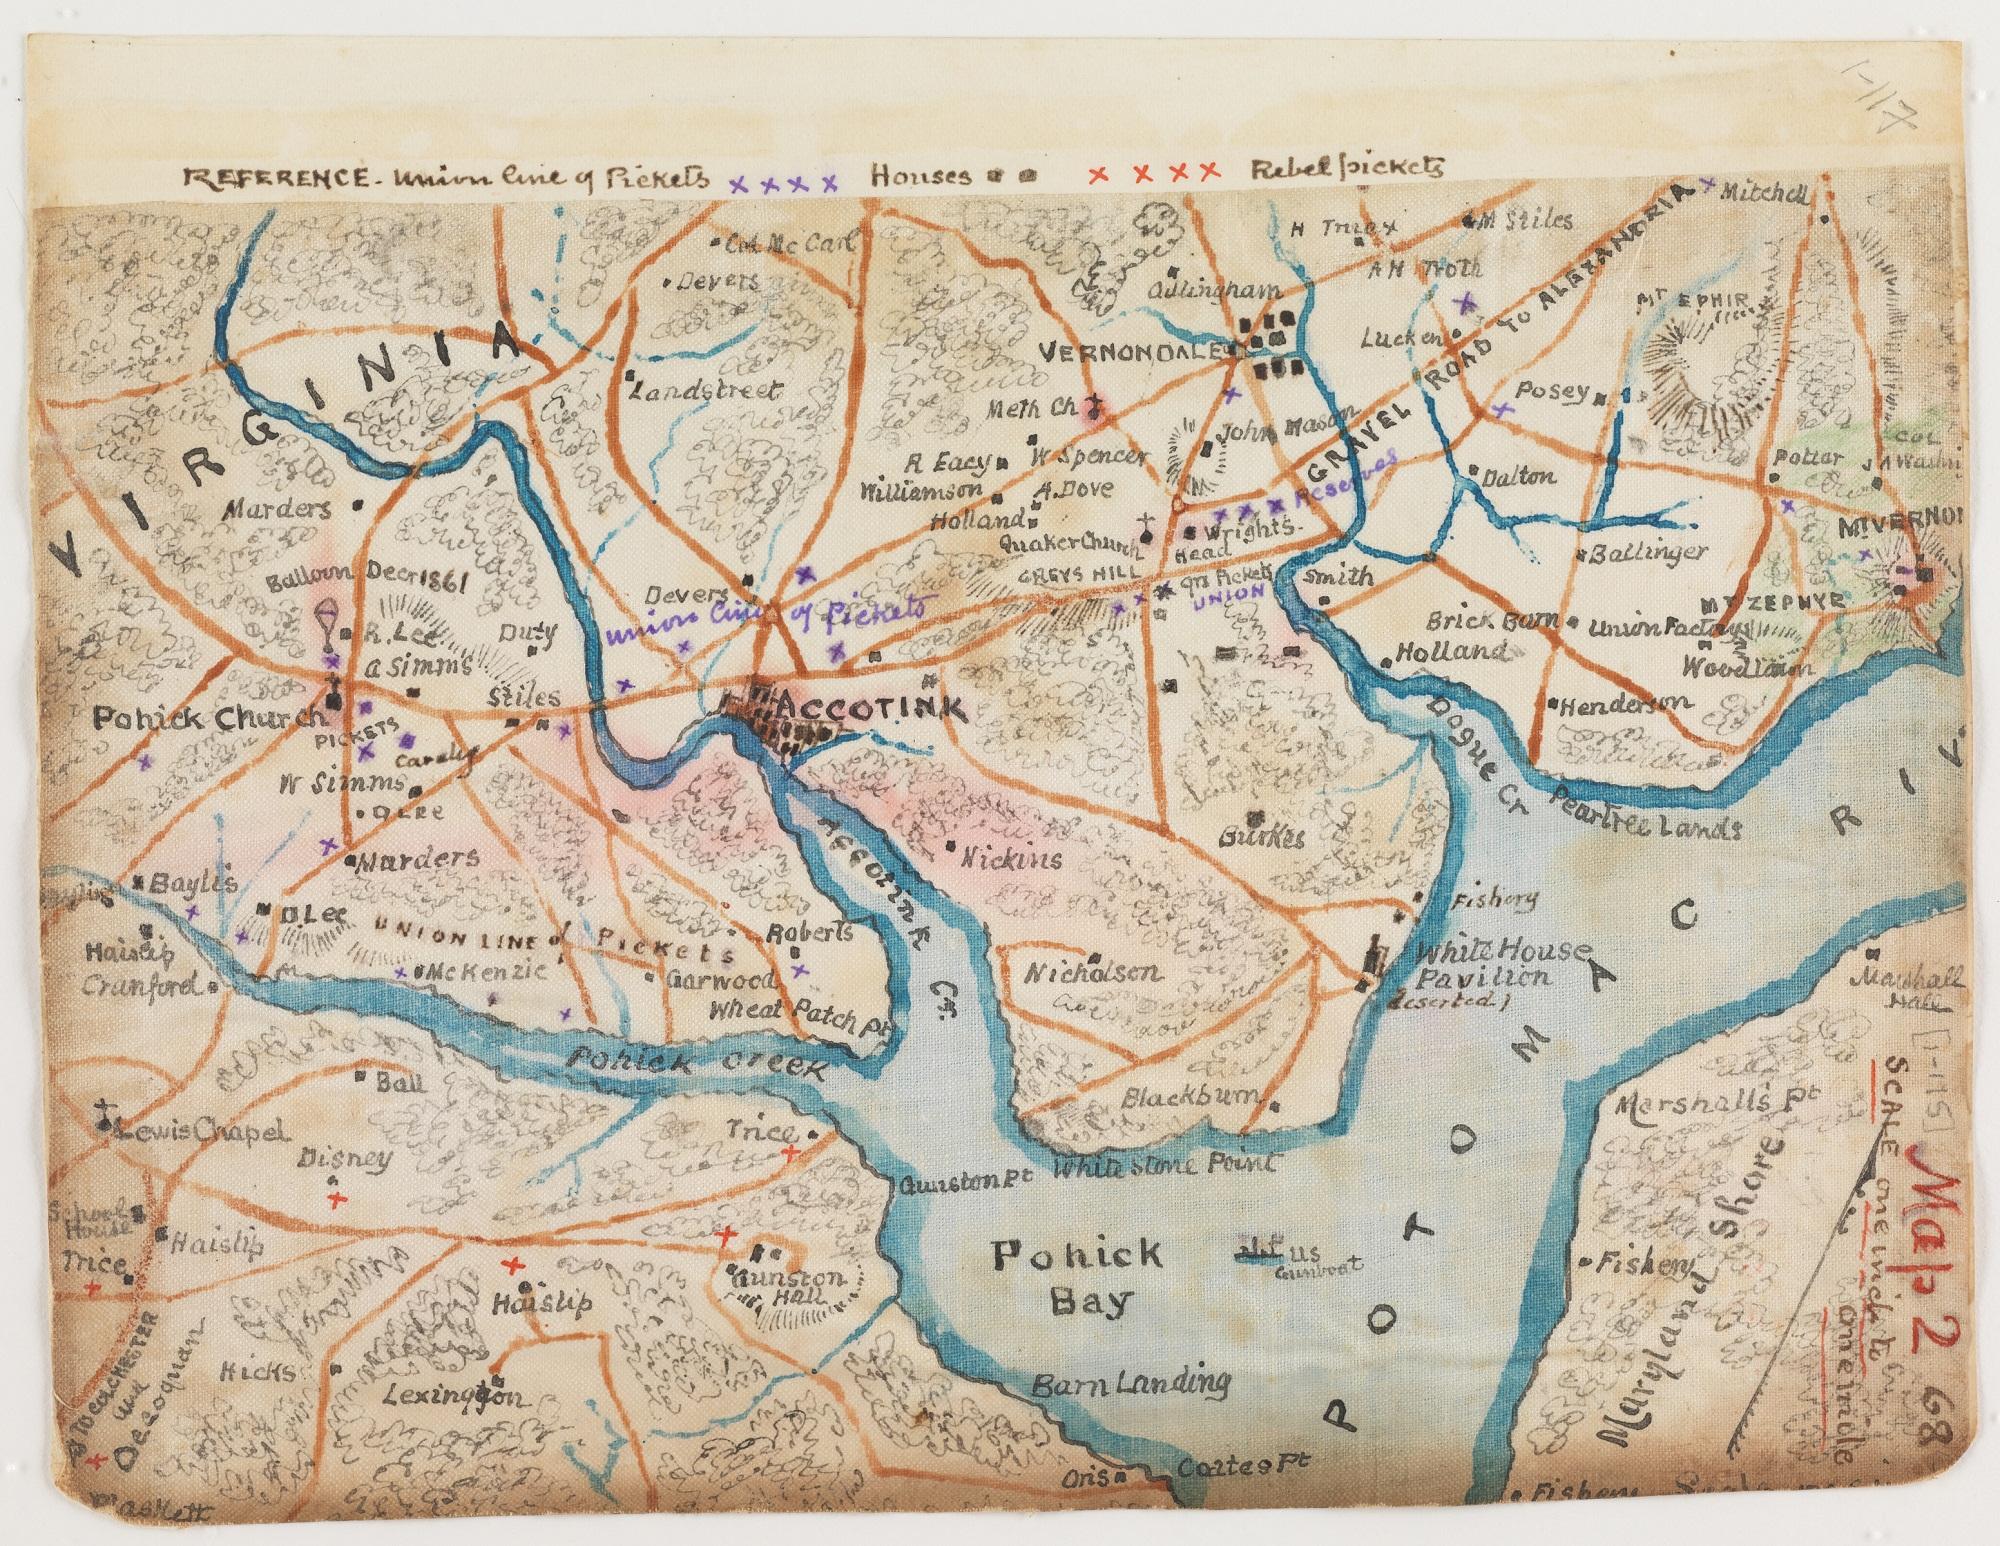 Sneden's map of Mason Neck